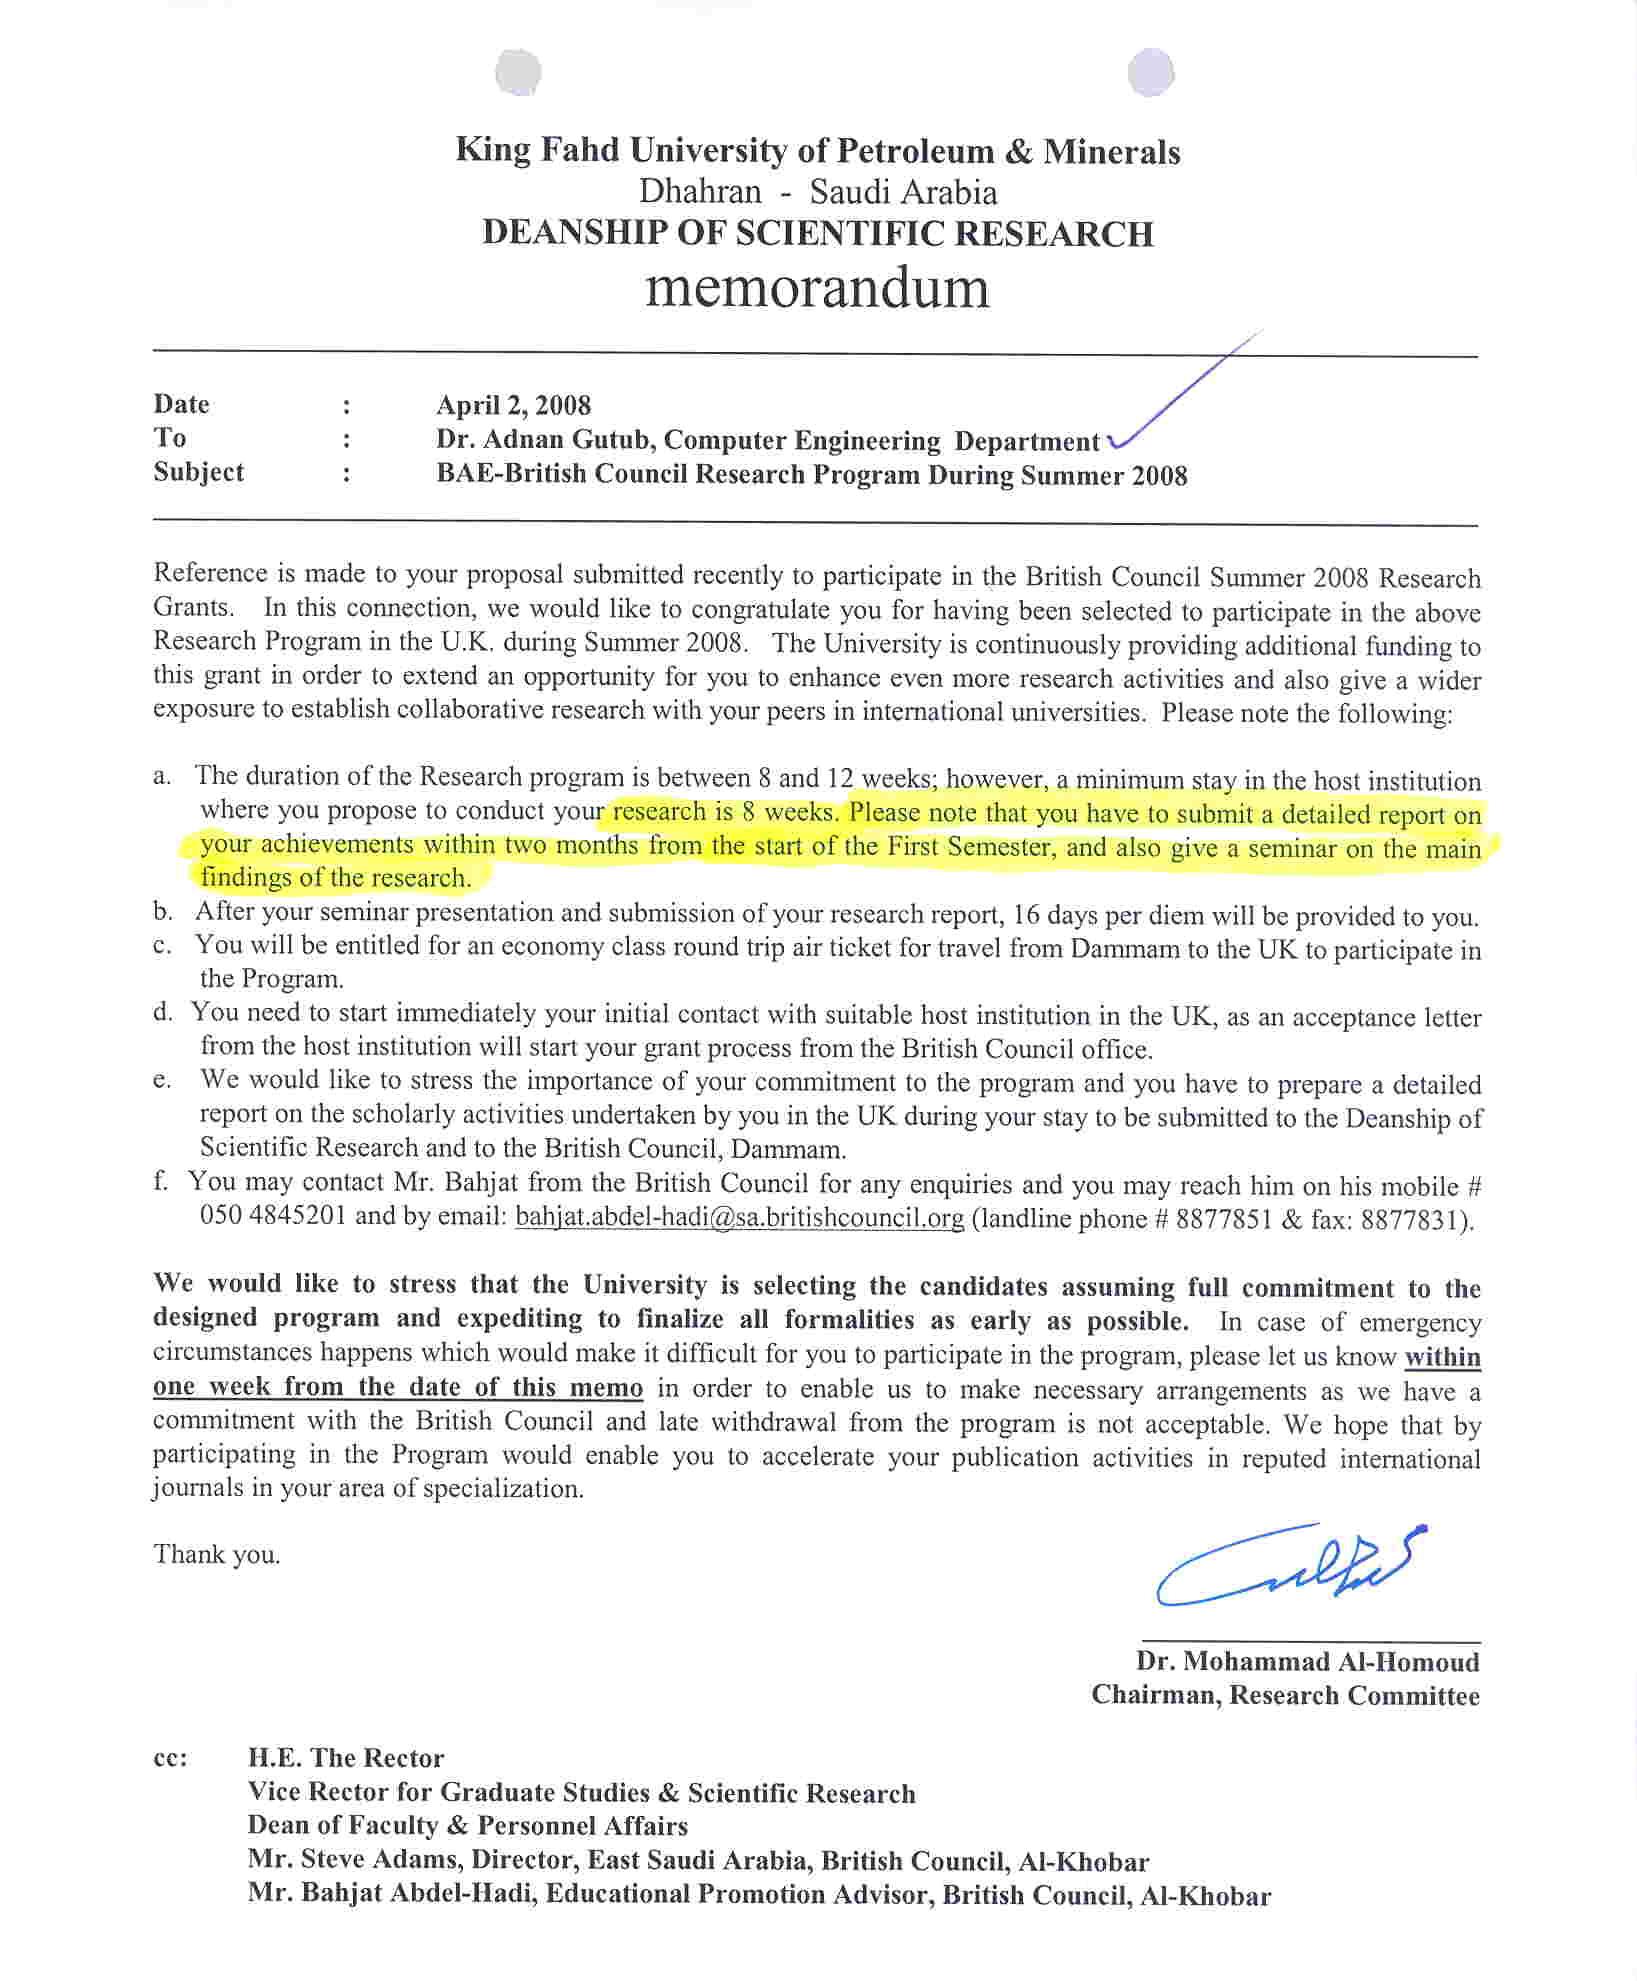 Representing kfupm adnan abdulaziz muhammad gutub department visit invitation pdf award letter jpg pdf stopboris Gallery